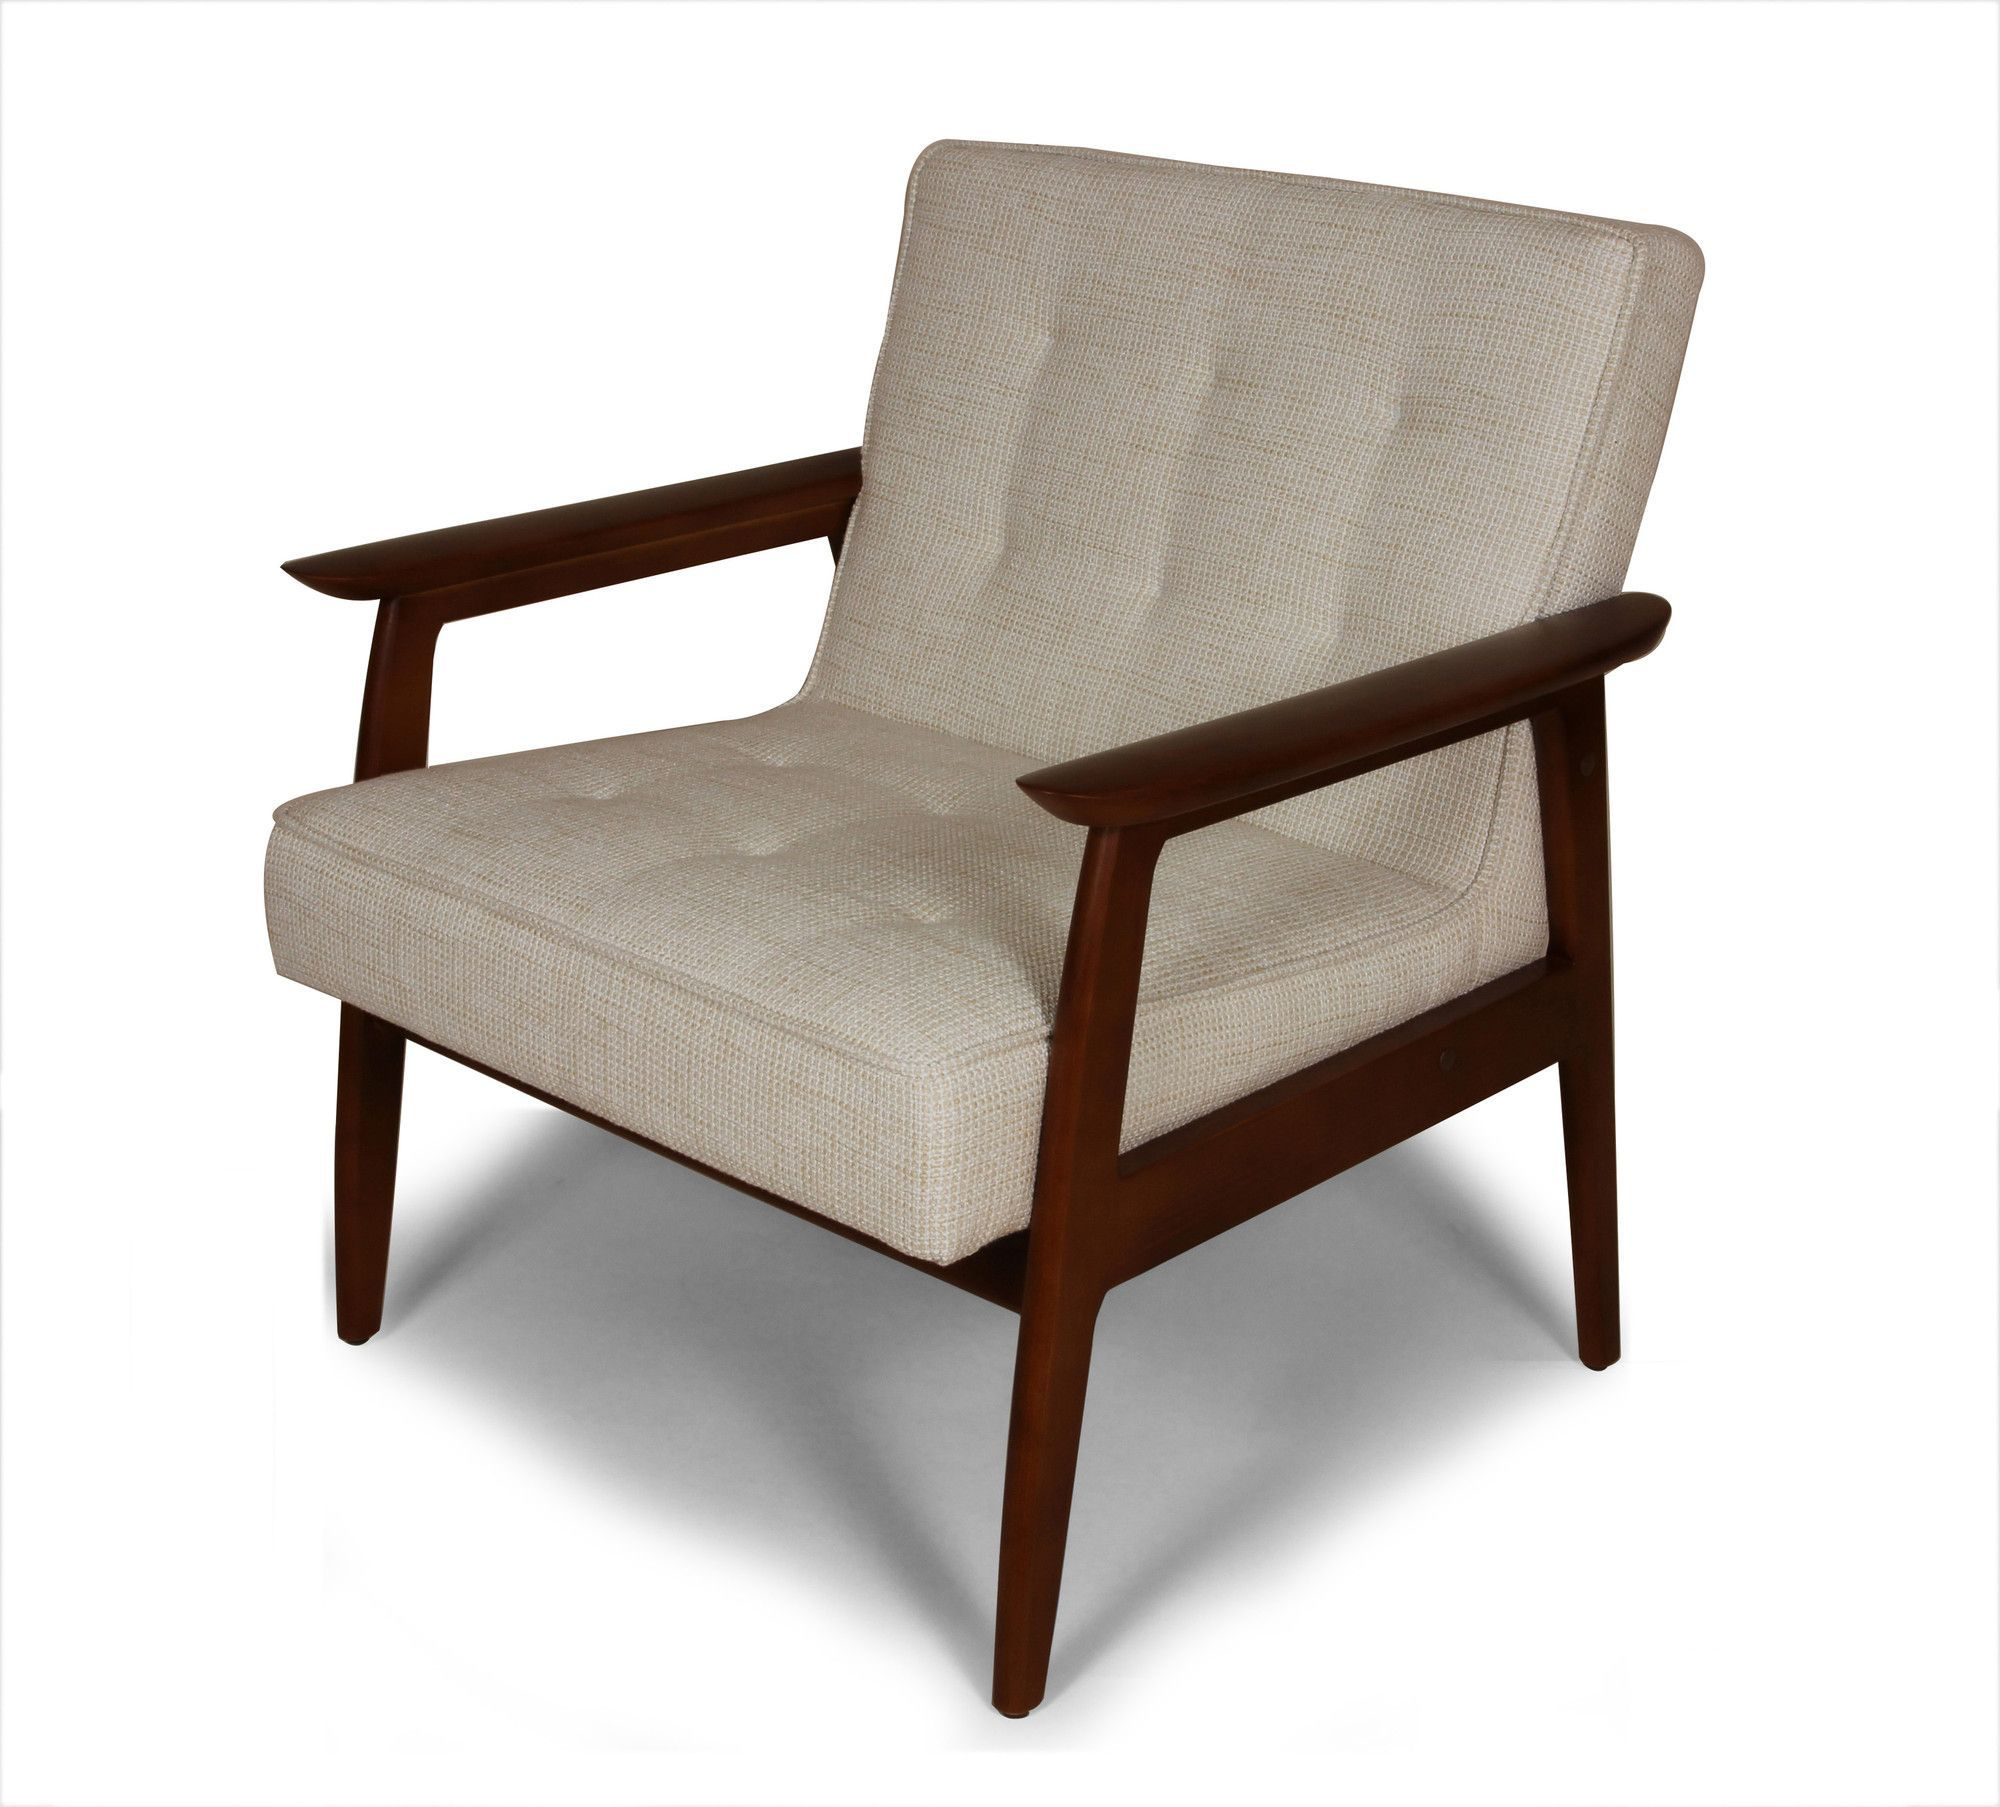 Astonishing Adrian Arm Chair Products Accent Chairs Chair Armchair Machost Co Dining Chair Design Ideas Machostcouk